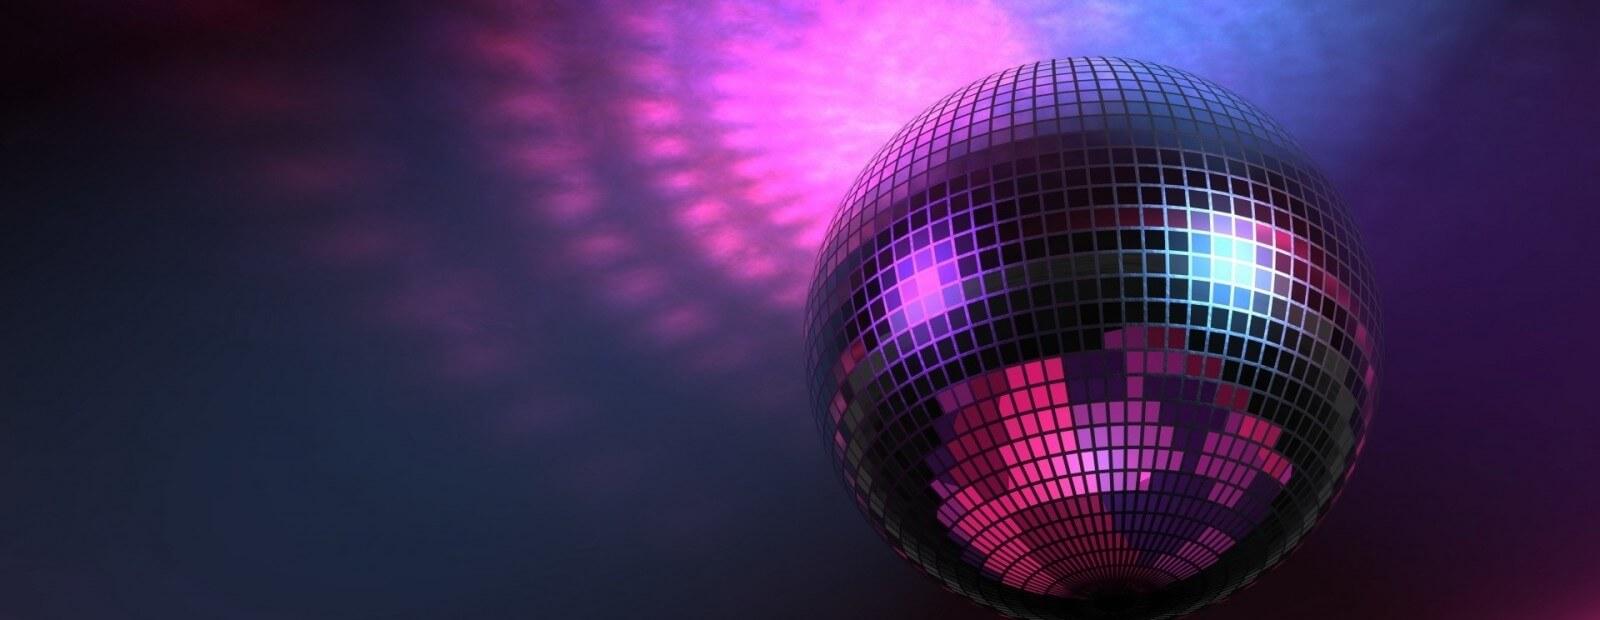 Los Lirios Nightclub